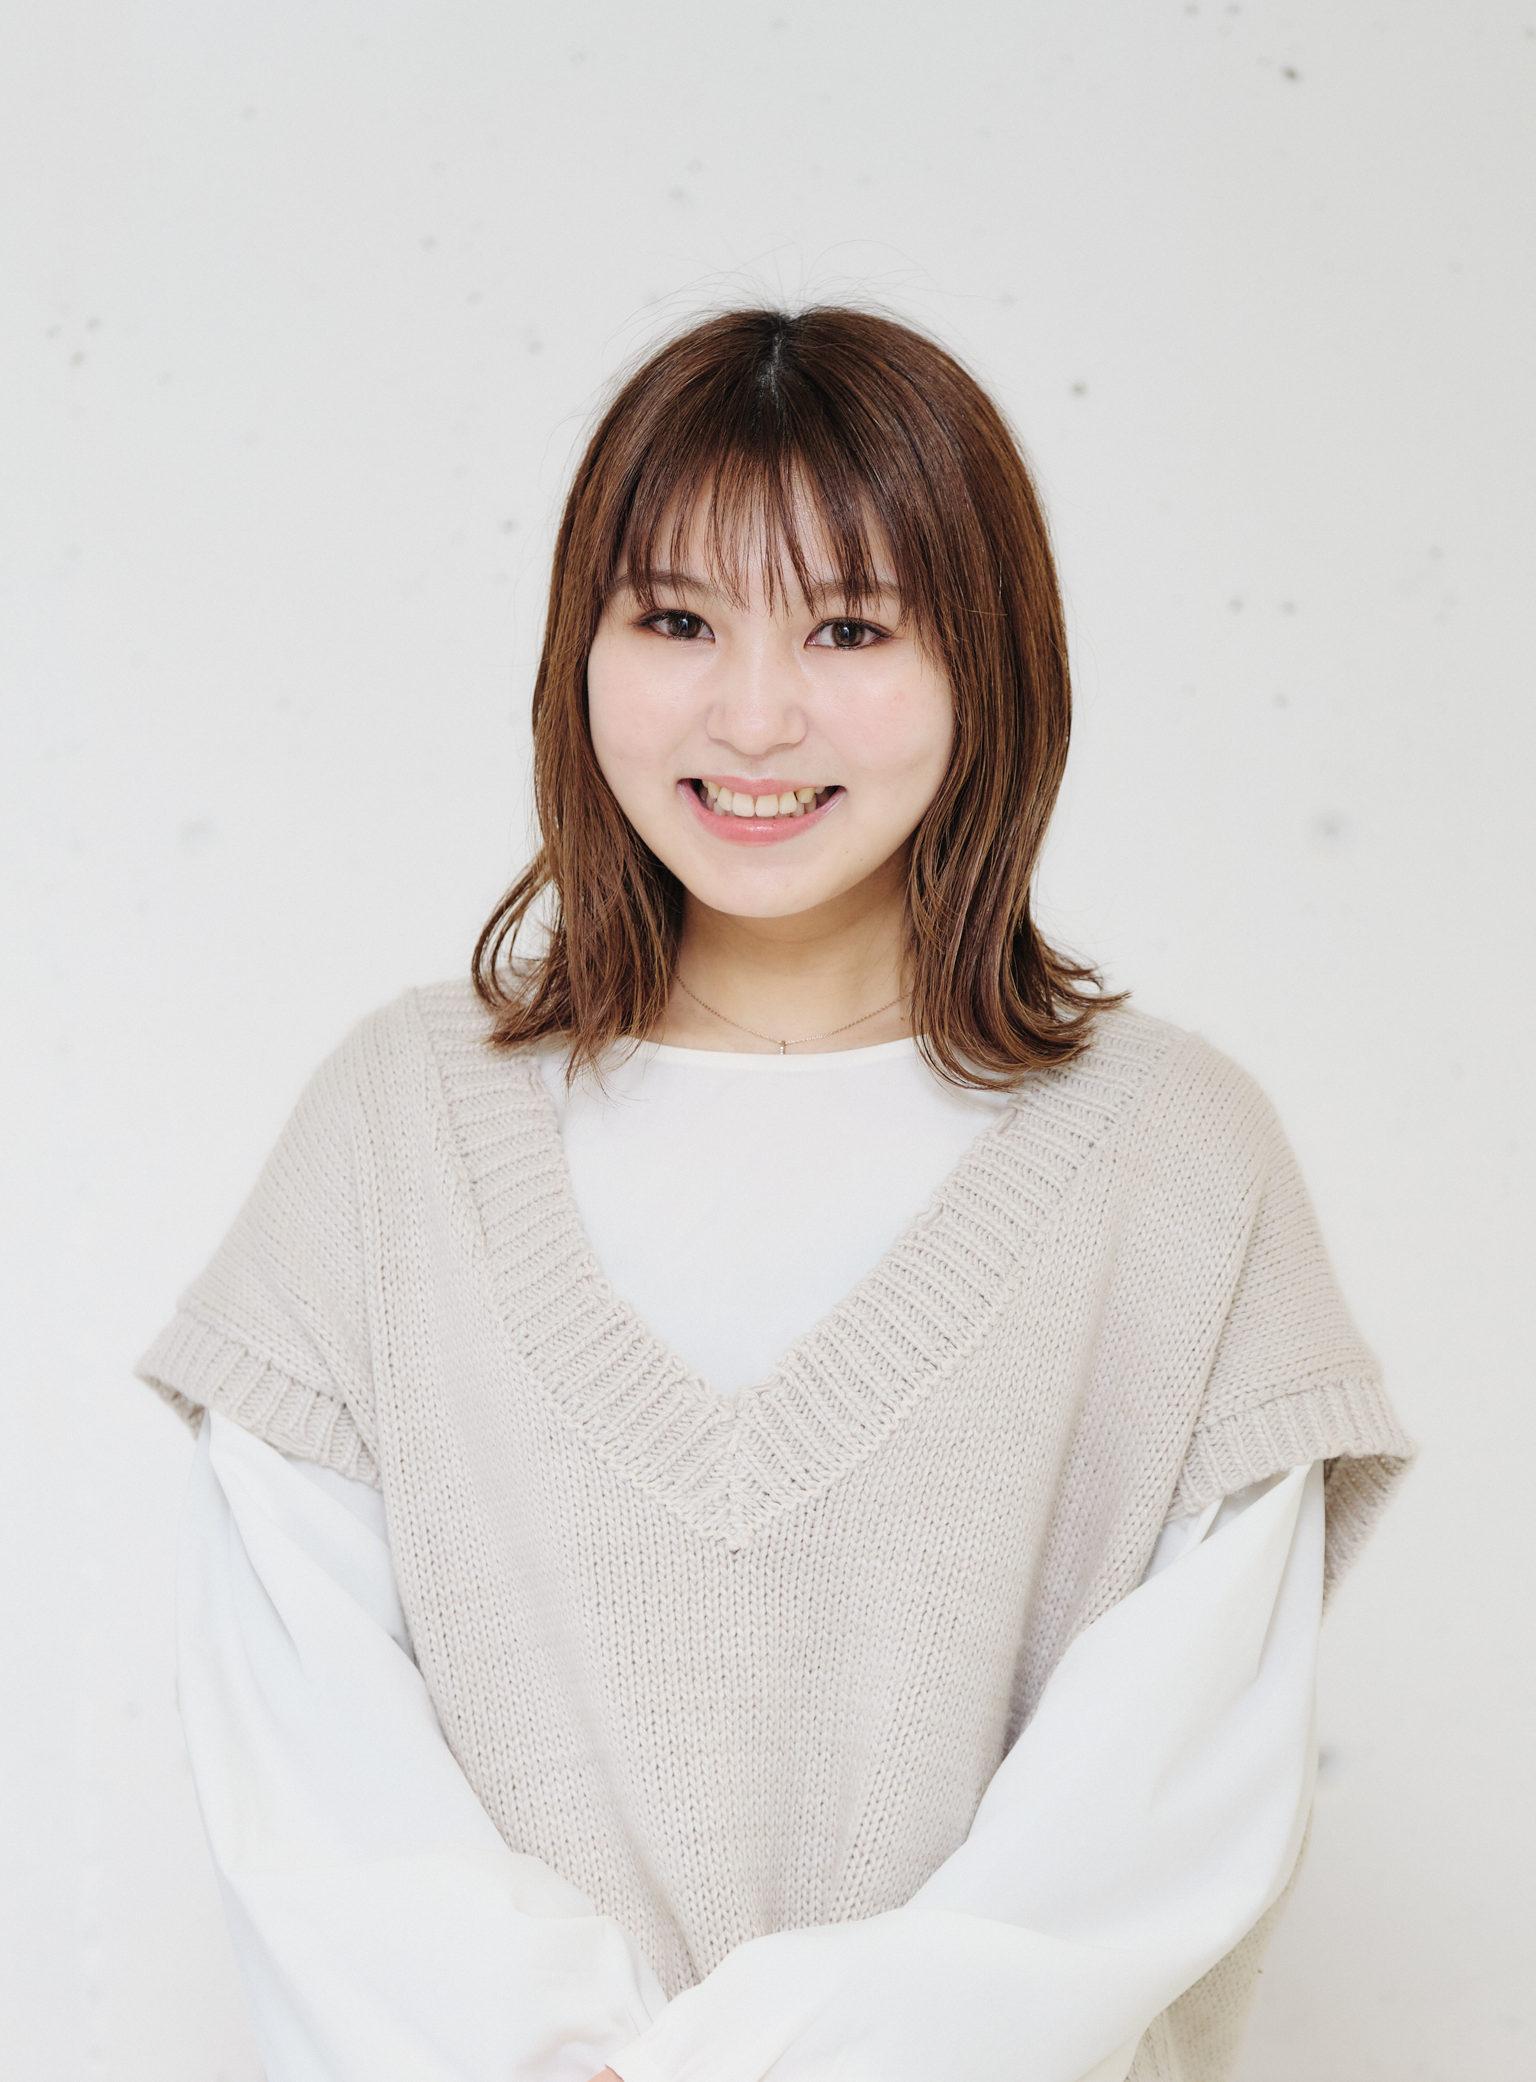 Akari Nishio (アカリ ニシオ)